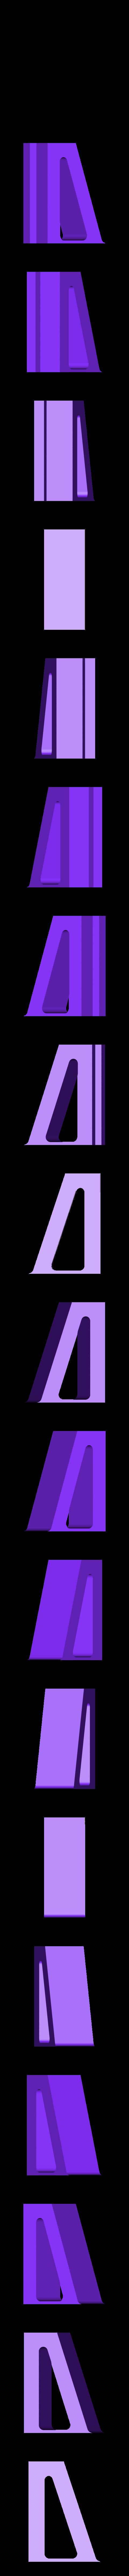 Arm1-C.STL Download free STL file Stand Press. 2 in 1 • Object to 3D print, perinski